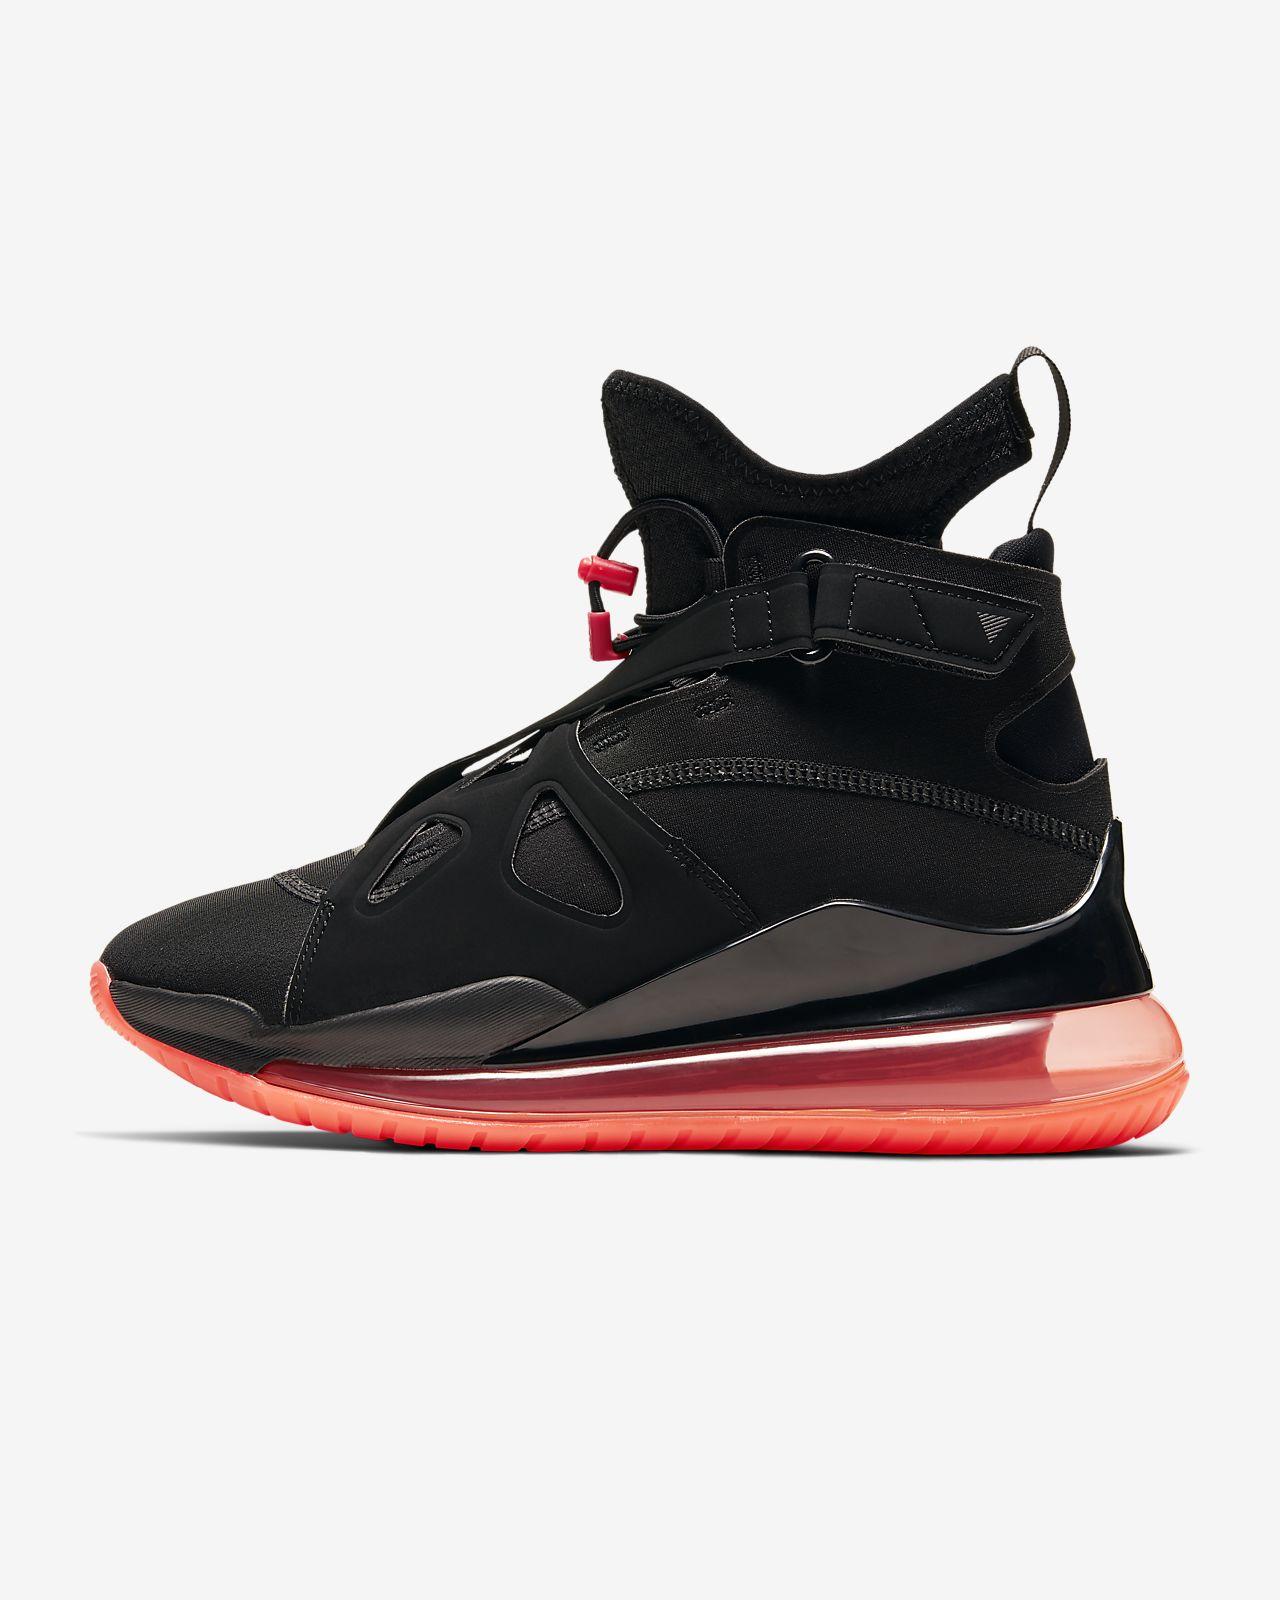 Jordan Air Latitude 720 女子运动鞋